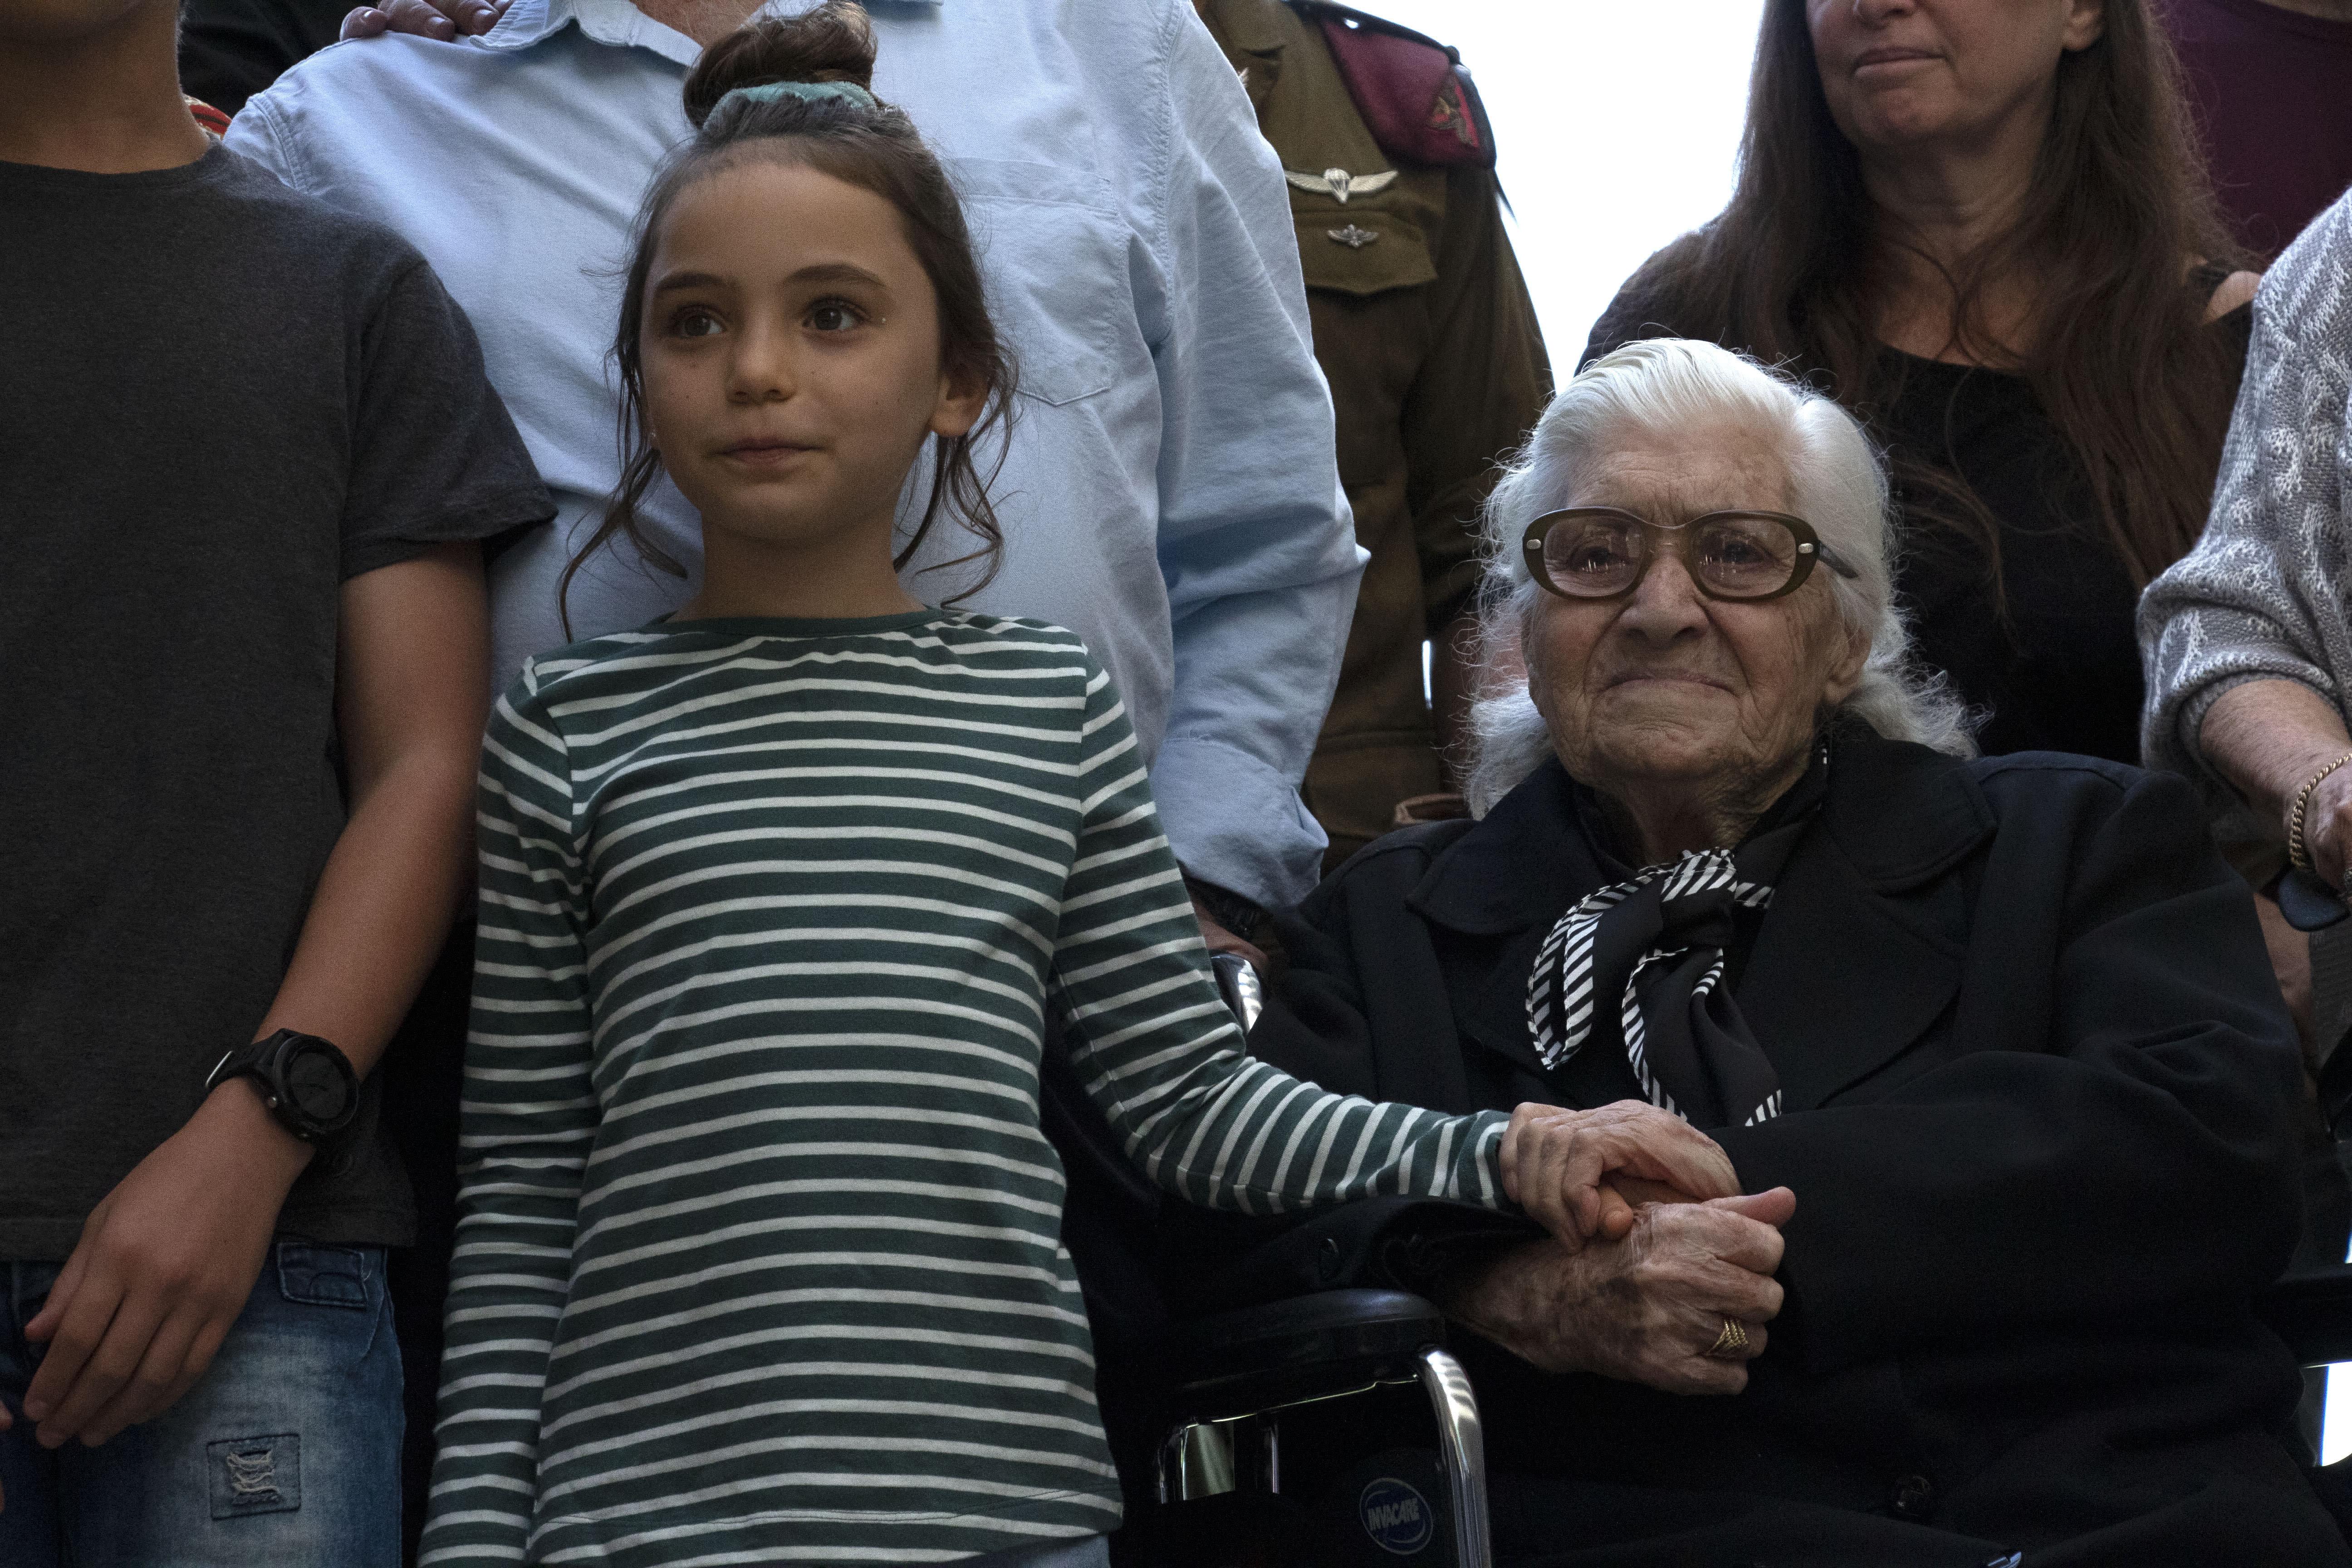 WW2 Jewish survivors in rare reunion with Greek rescuer